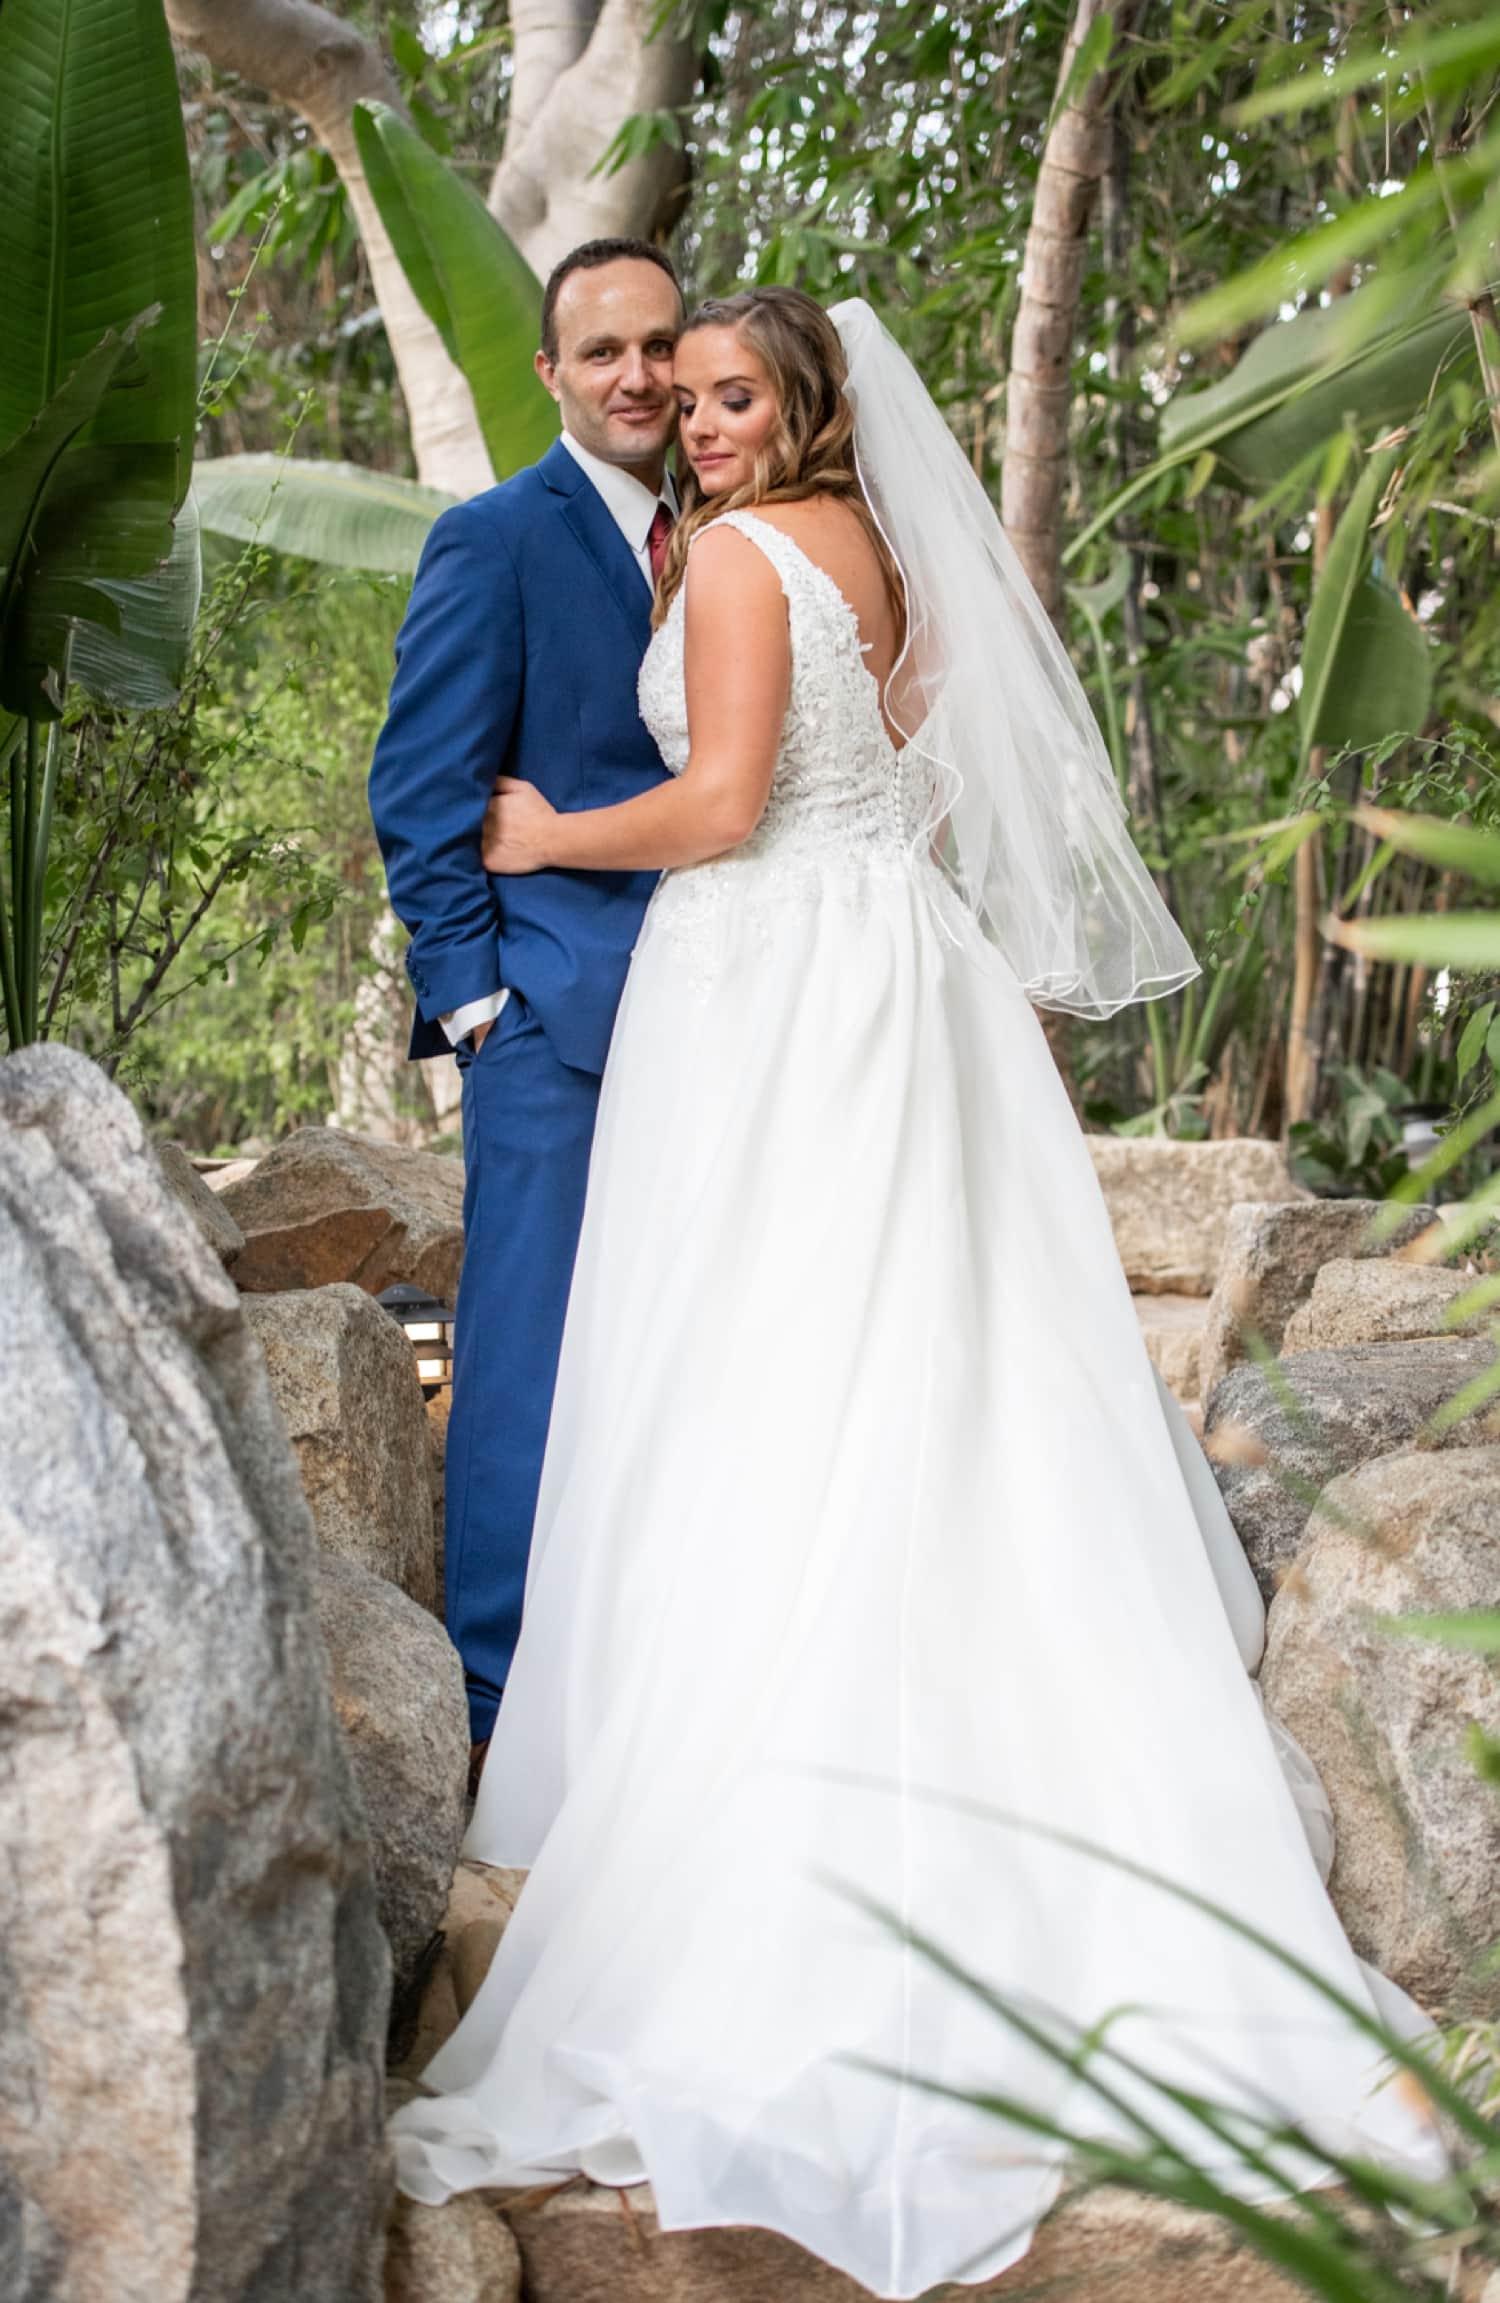 Vicki + Ryan    Protea Inspired Wedding    Paradise Falls 87af0a406